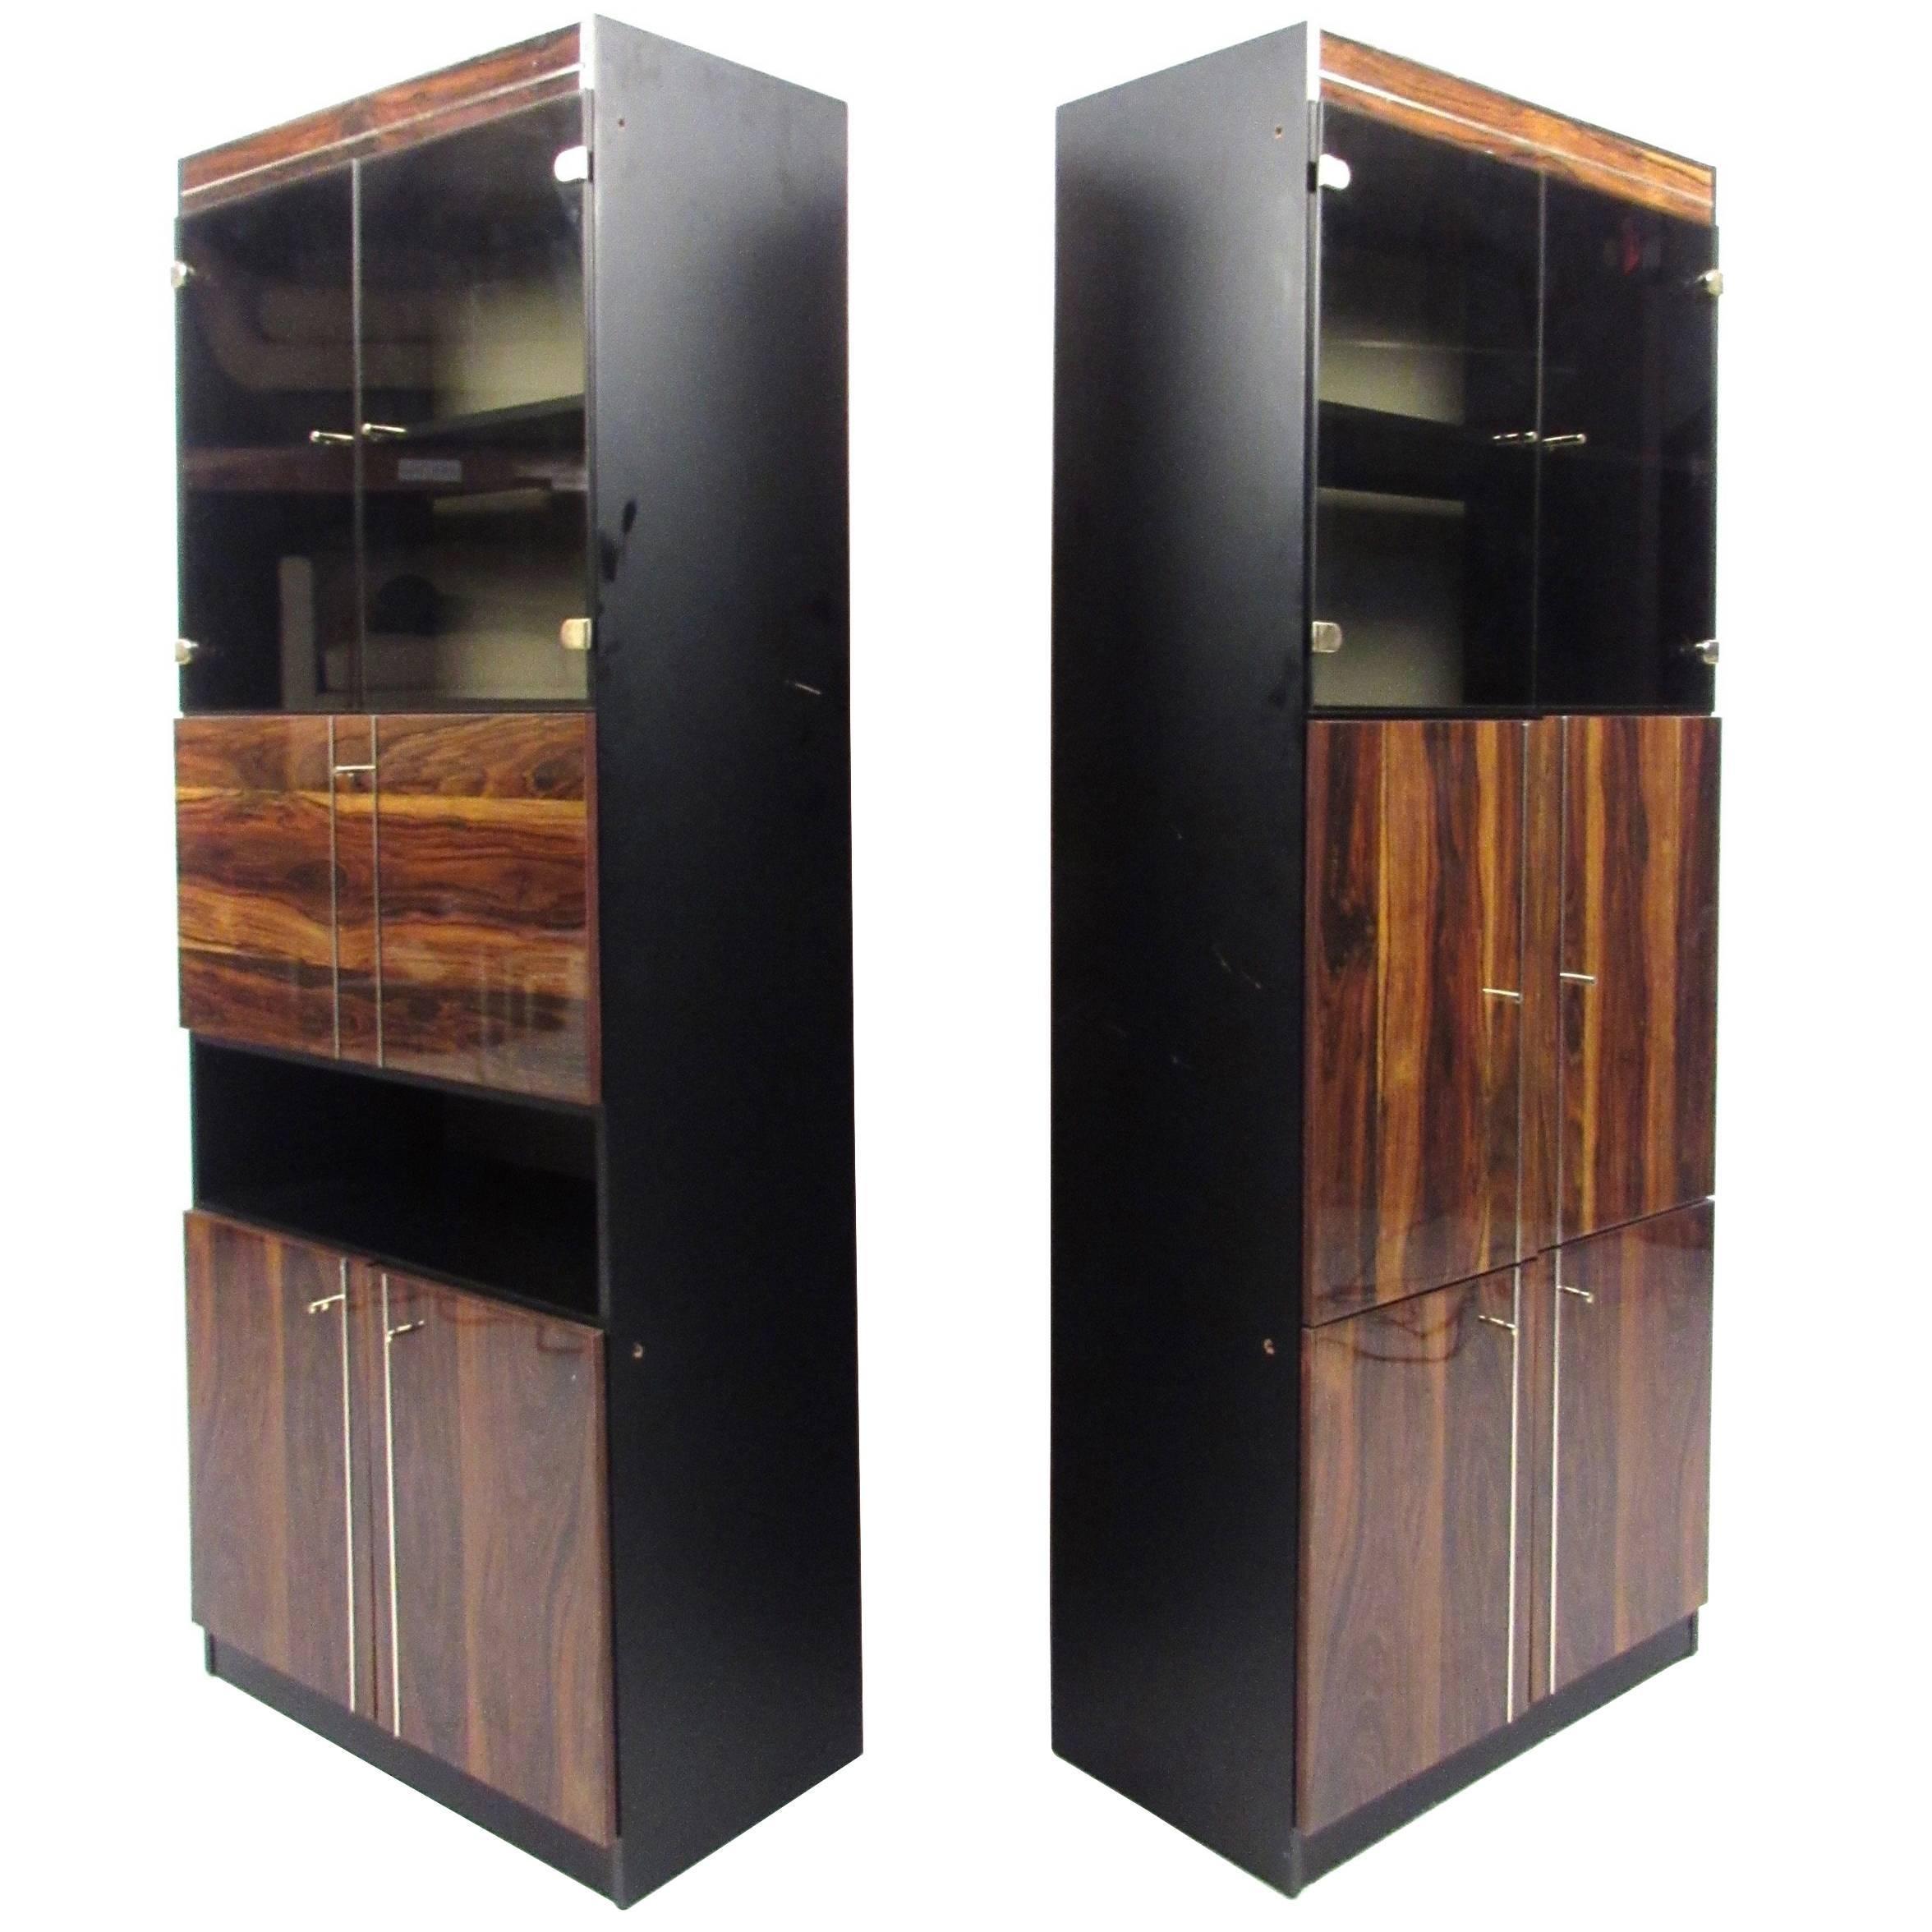 Pair of Modern Bookshelf Display Cabinets